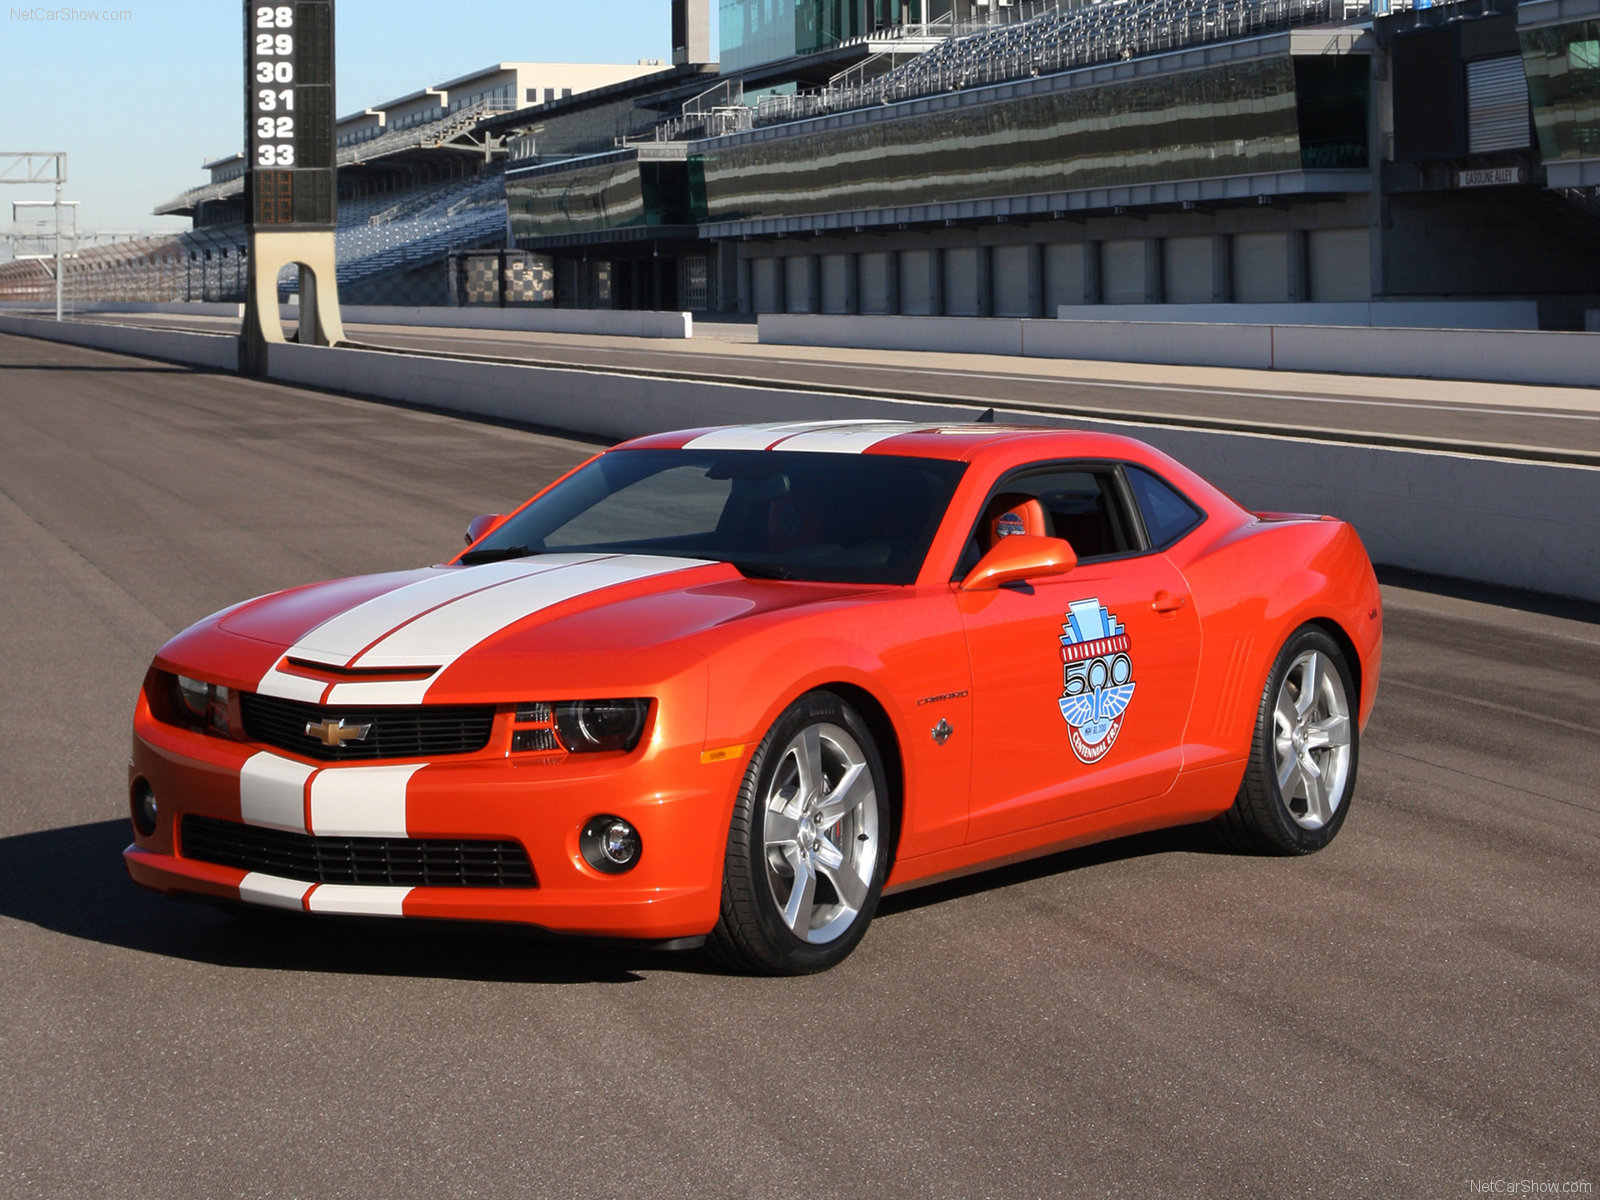 http://2.bp.blogspot.com/-11qj7584Vl0/T-YRLNFDe2I/AAAAAAAAA-w/IHpoV7913uA/s1600/Chevrolet-Camaro_SS_Indy_500_Pace_Car_2010_1600x1200_wallpaper_02.jpg